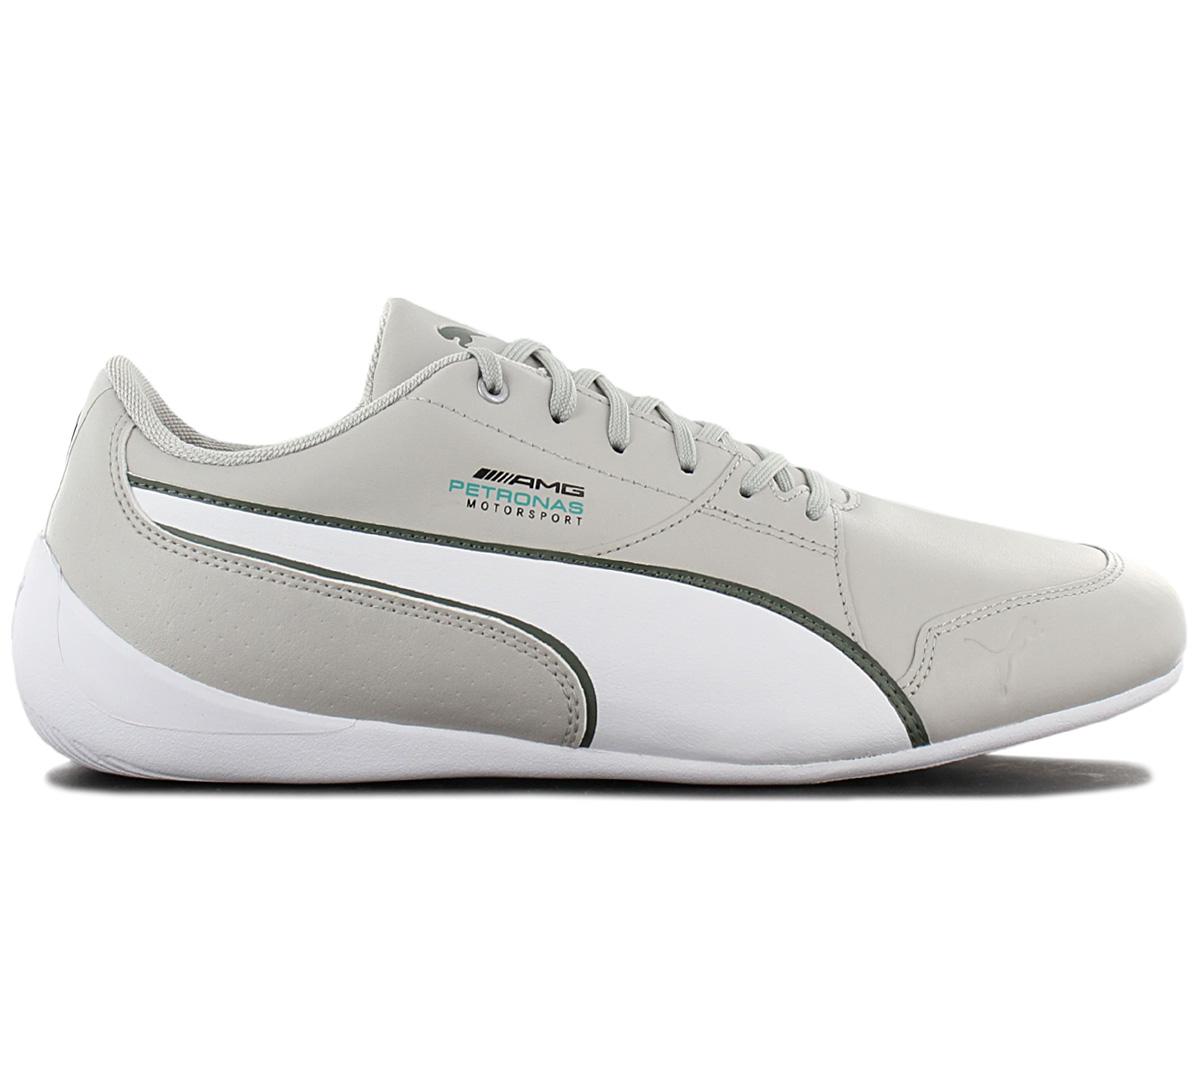 Details zu PUMA Mercedes AMG Petronas Motorsport Drift Cat 7 Herren Sneaker 306150 03 Schuh